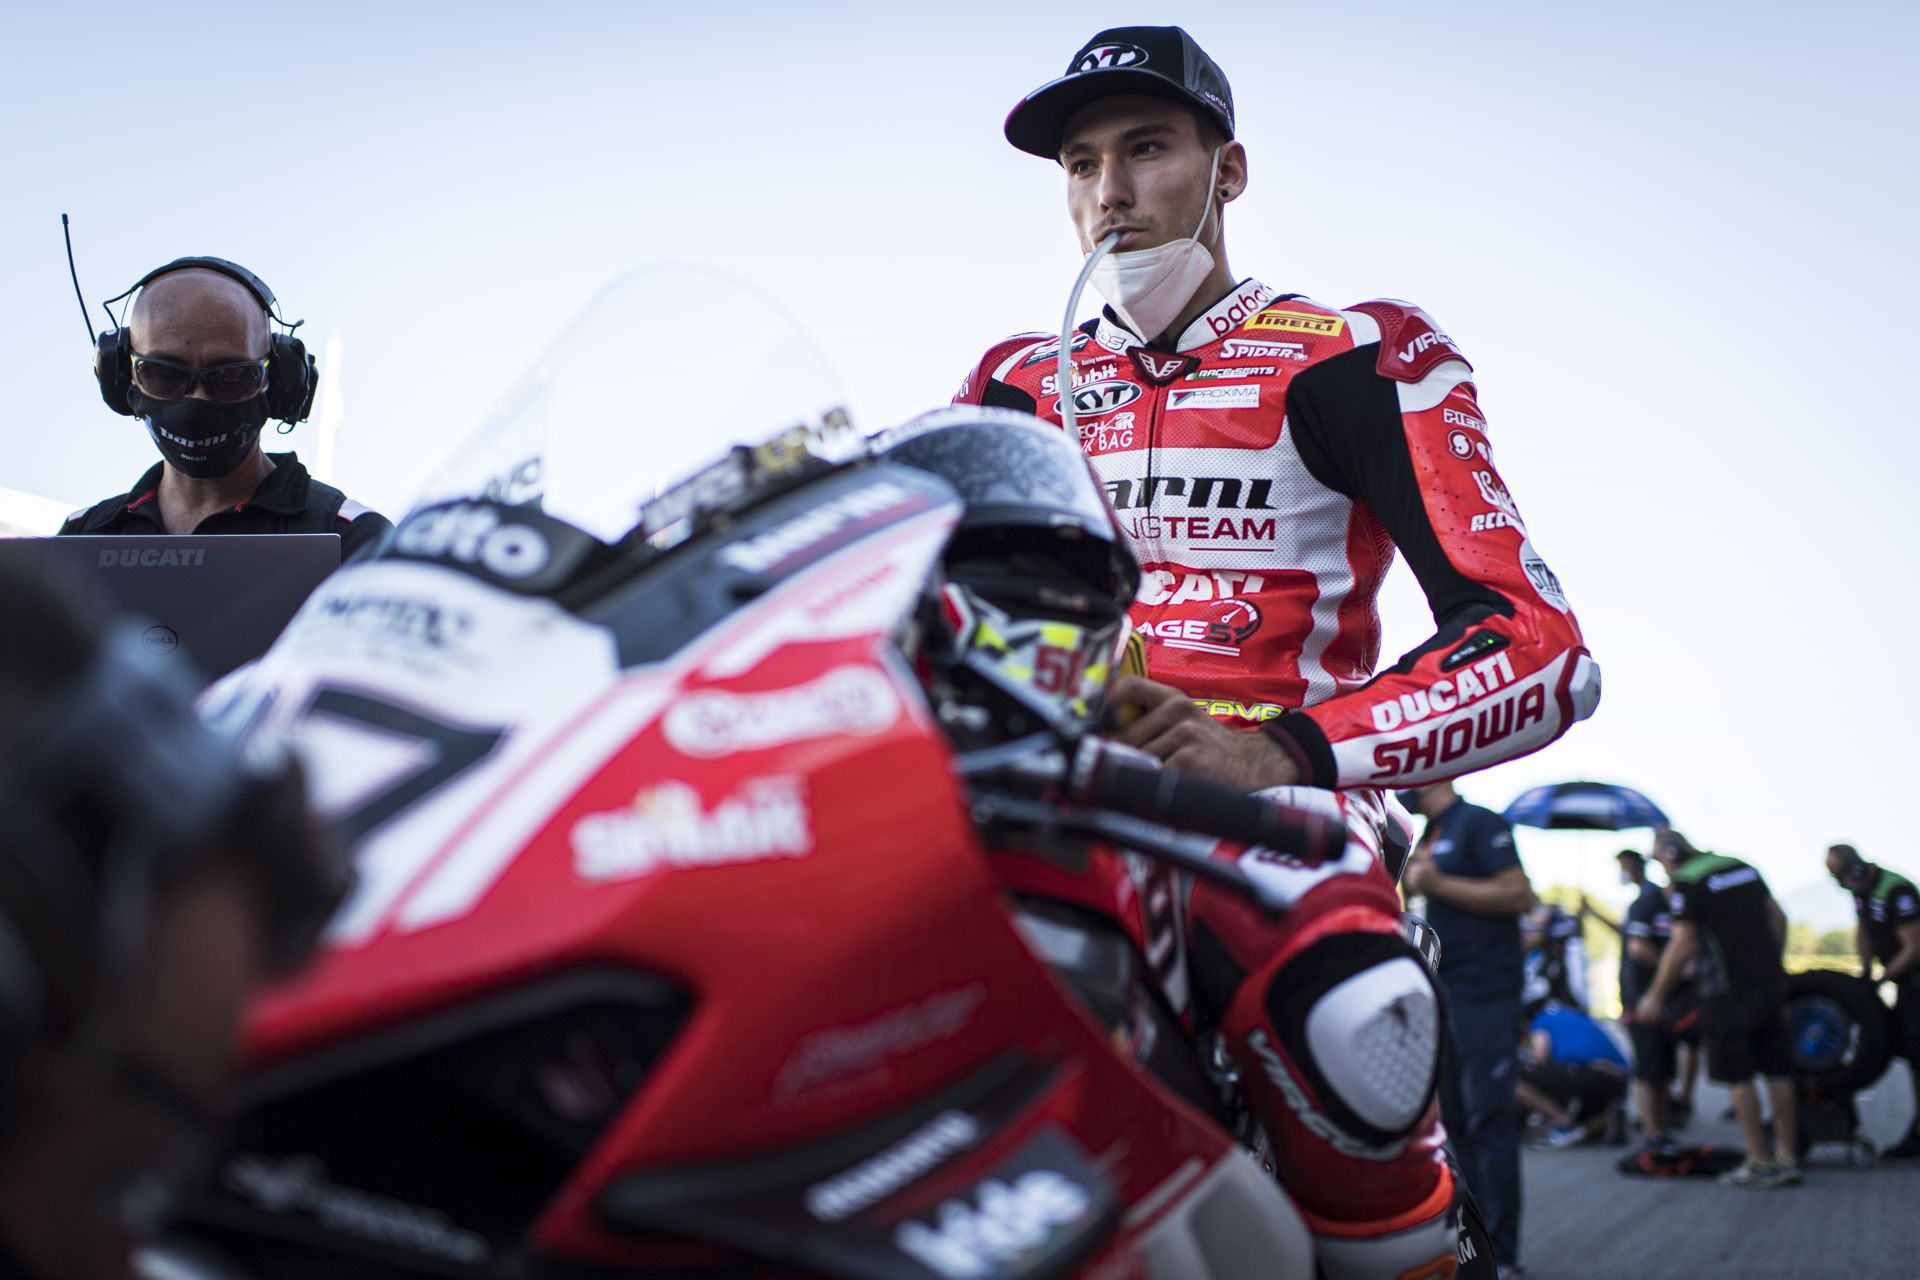 Samuele Cavalieri terminará la temporada con la Ducati del Team Barni